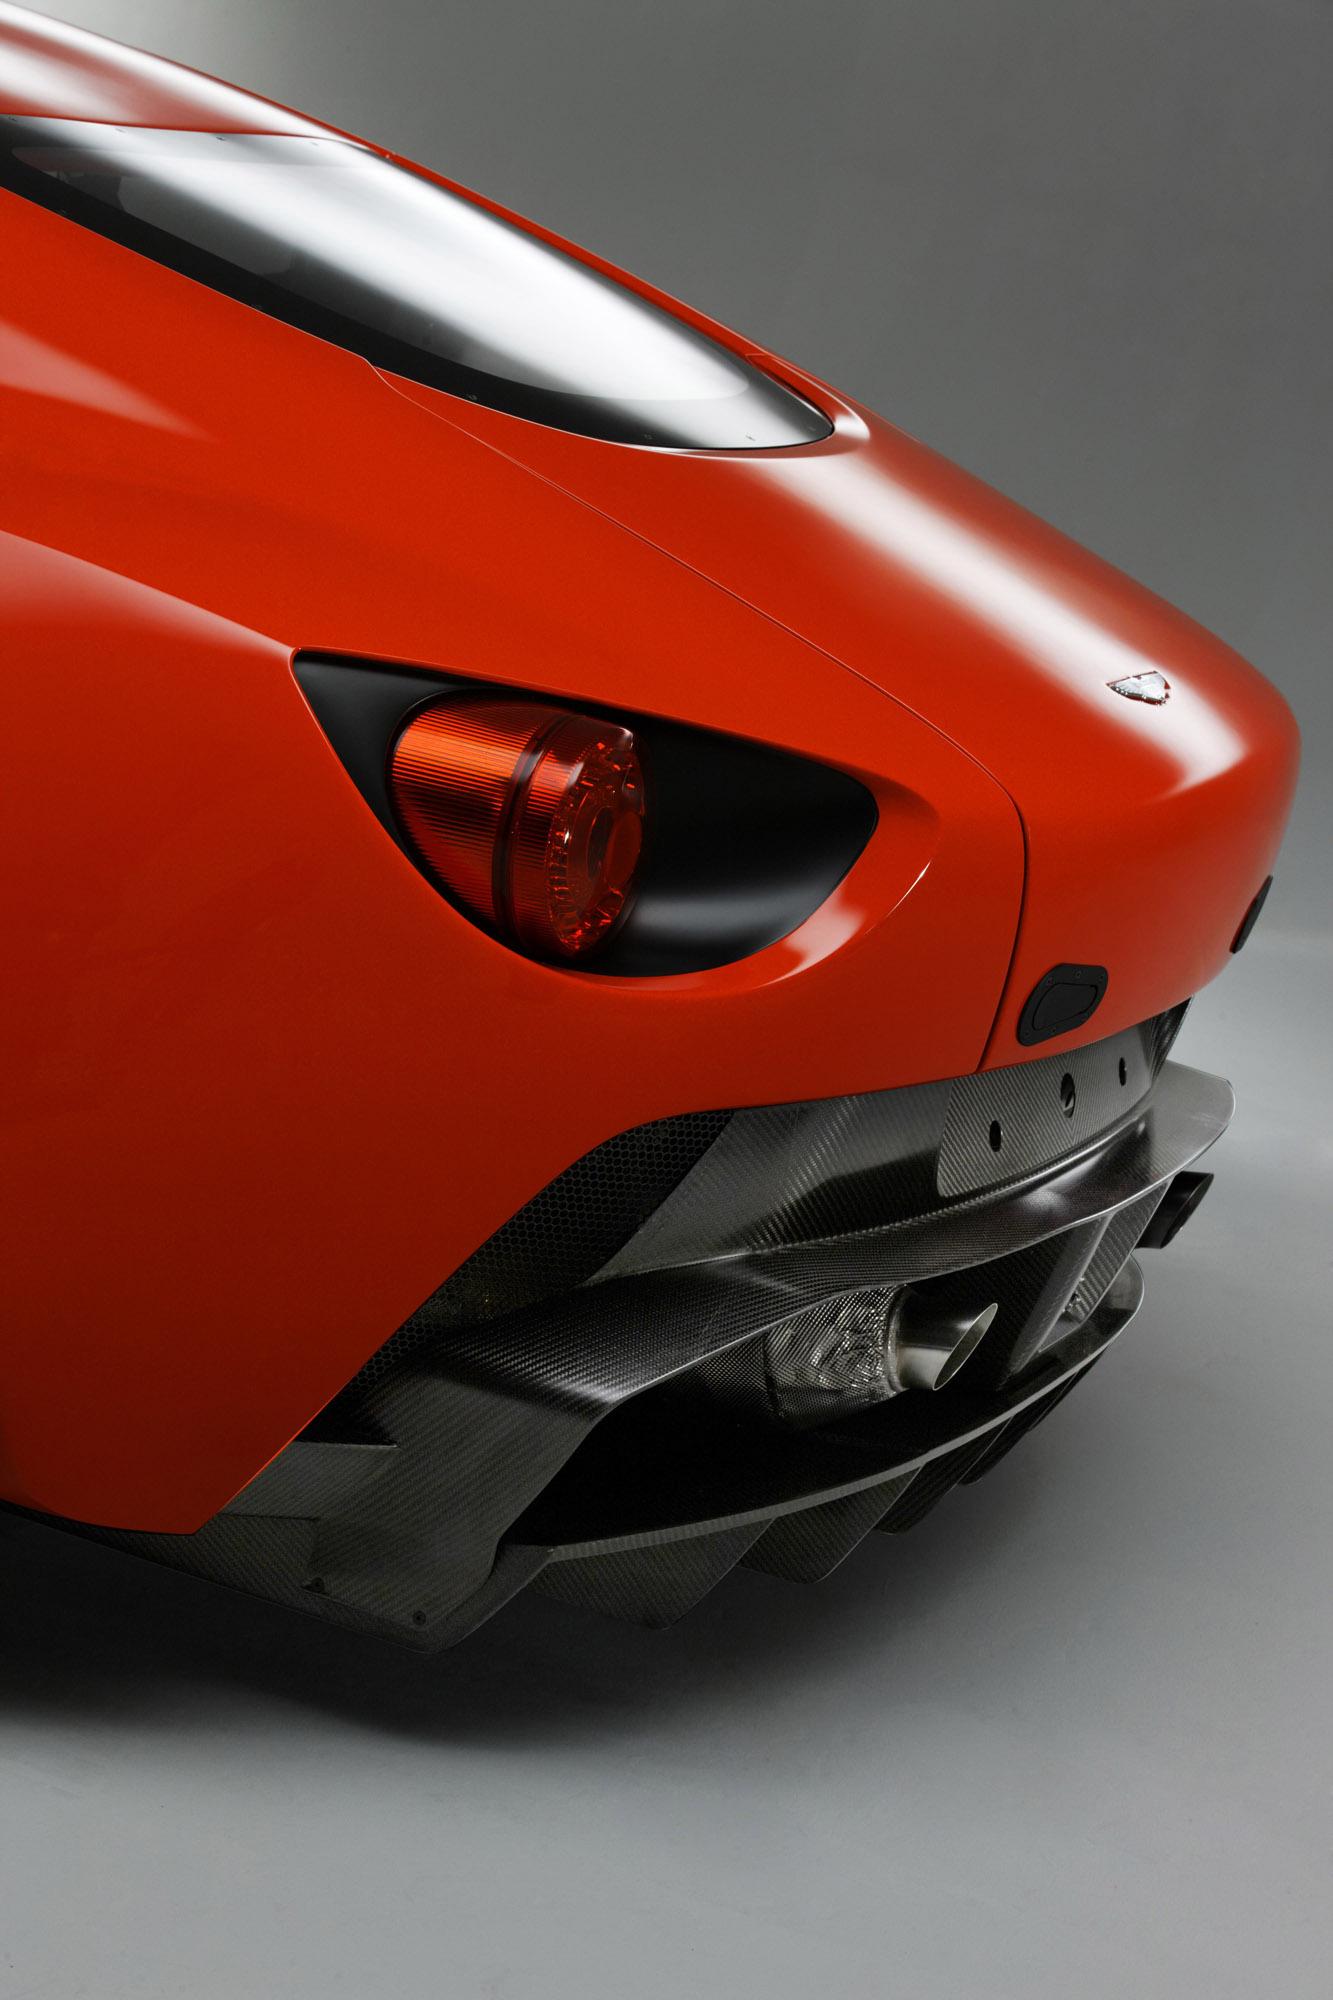 2011 Aston Martin V12 Zagato - фотография №9